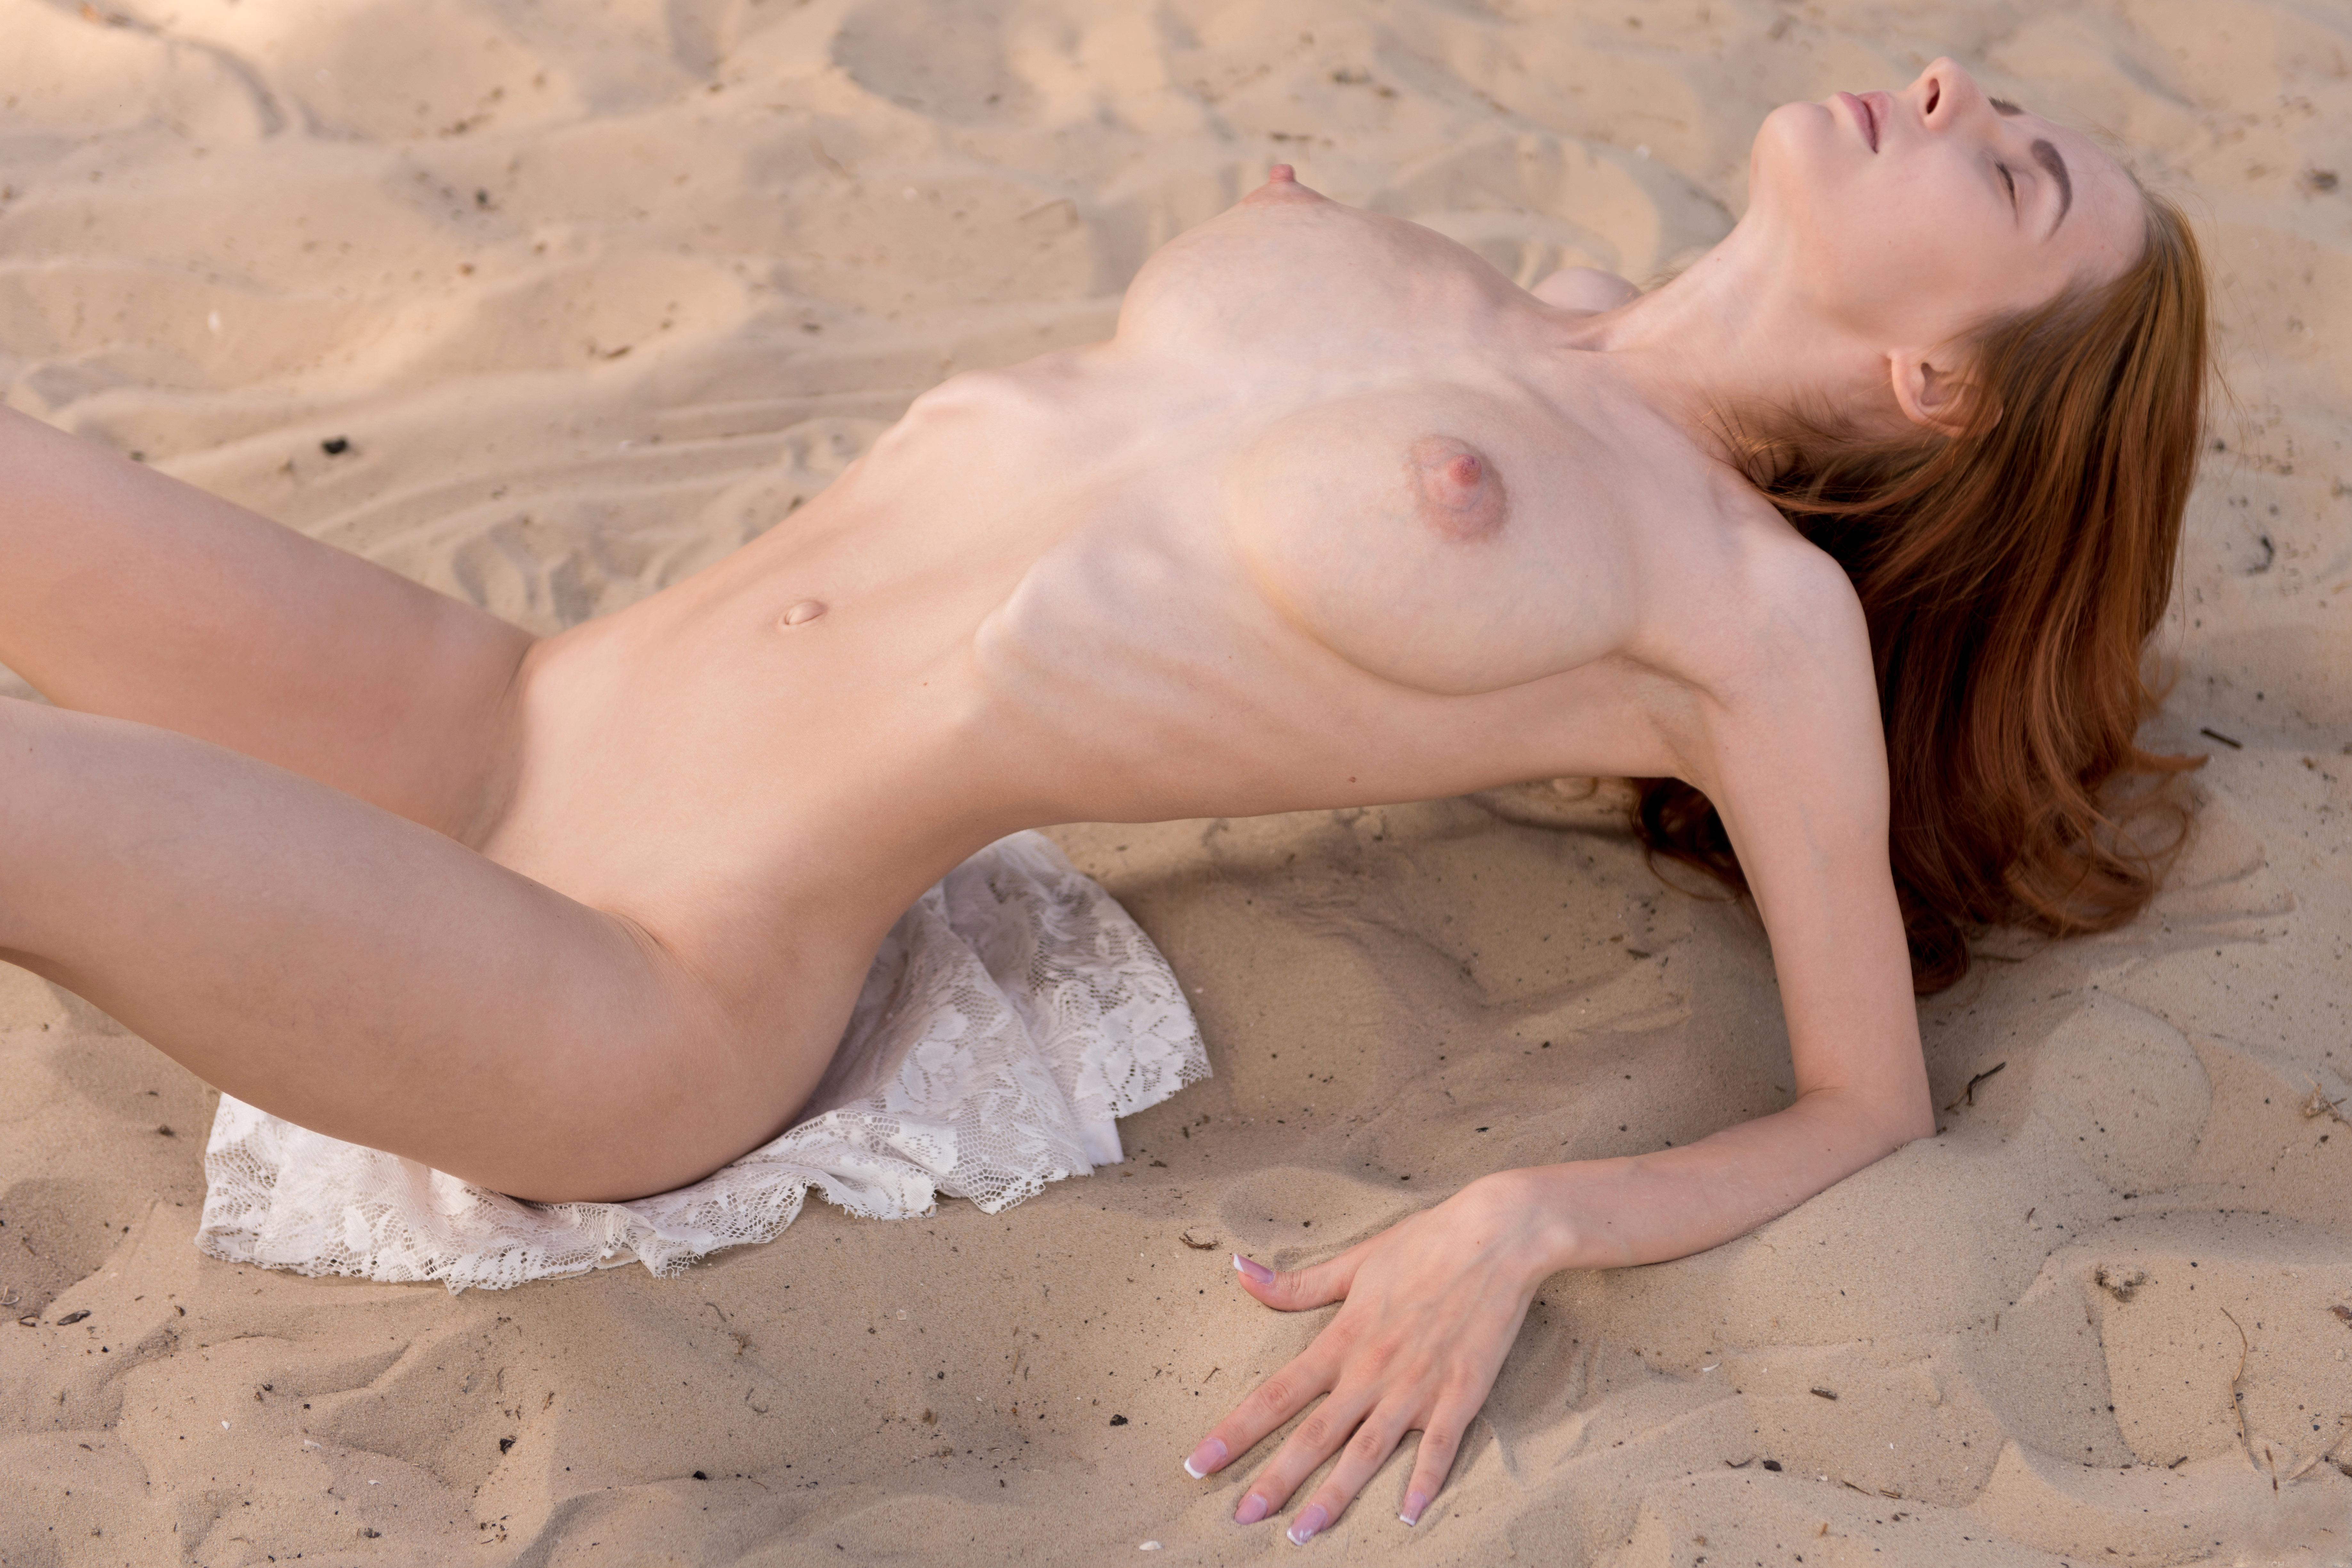 Congratulate, Petite redhead hard nipples suggest you